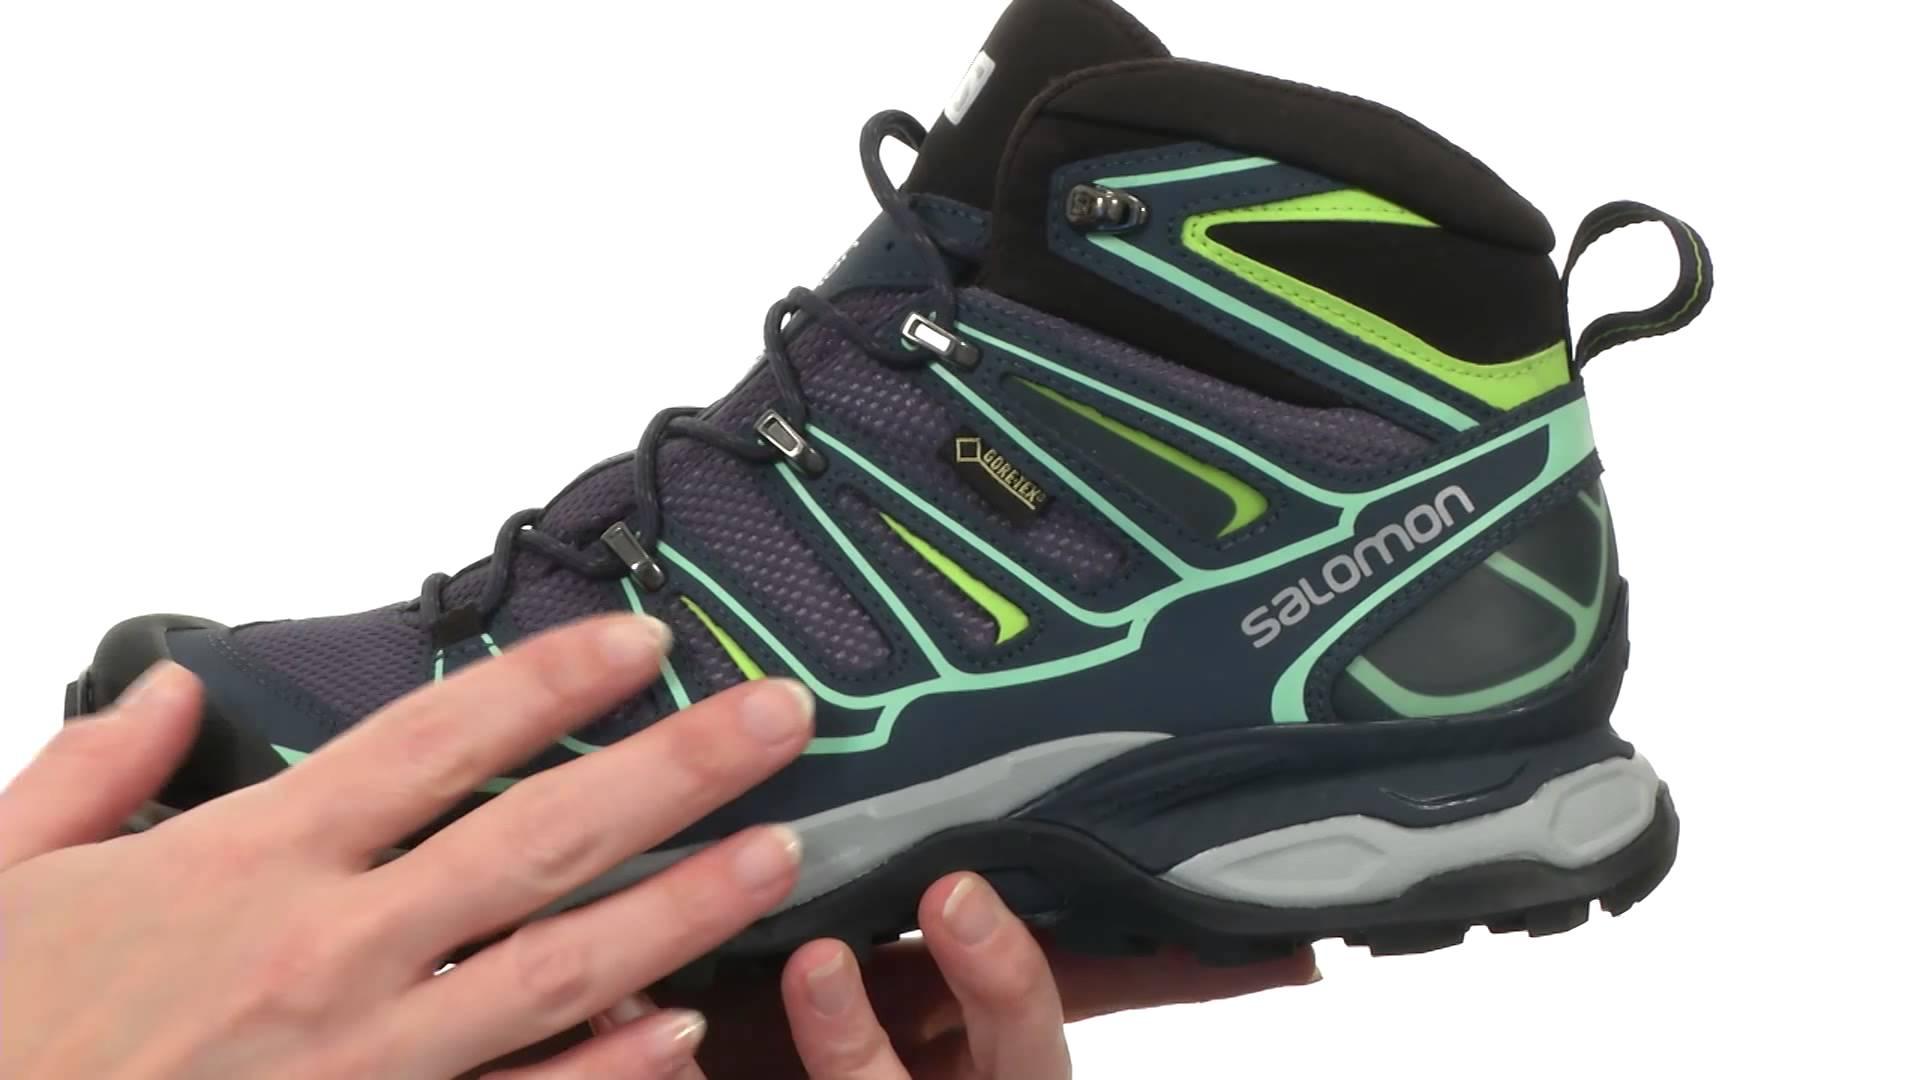 eedc51994f1 ▷ Classement   Guide d achat  Top chaussures de randonnee En Mai 2019